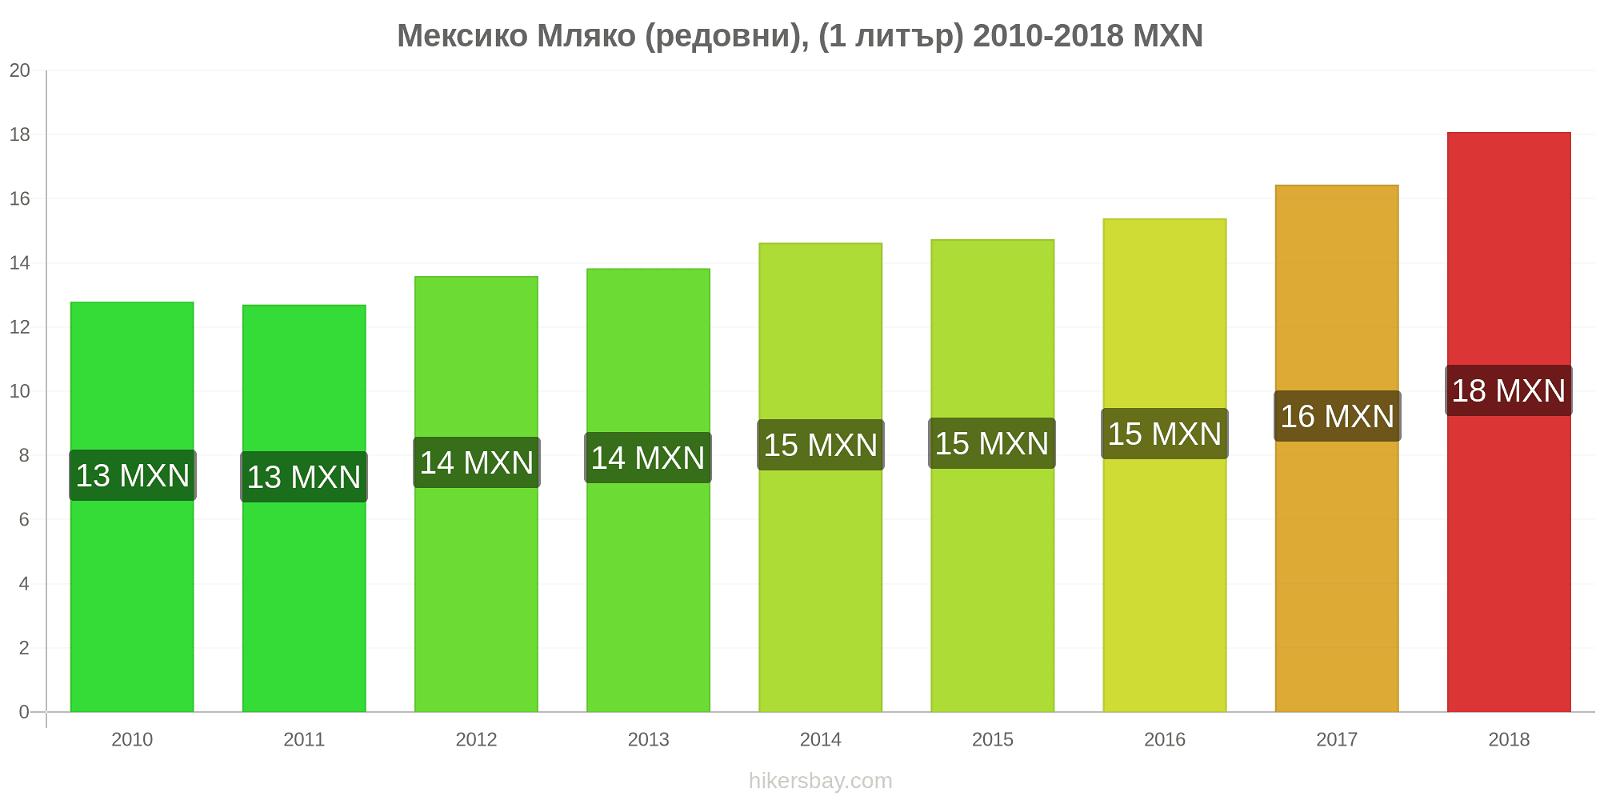 Мексико ценови промени Мляко (редовни), (1 литър) hikersbay.com